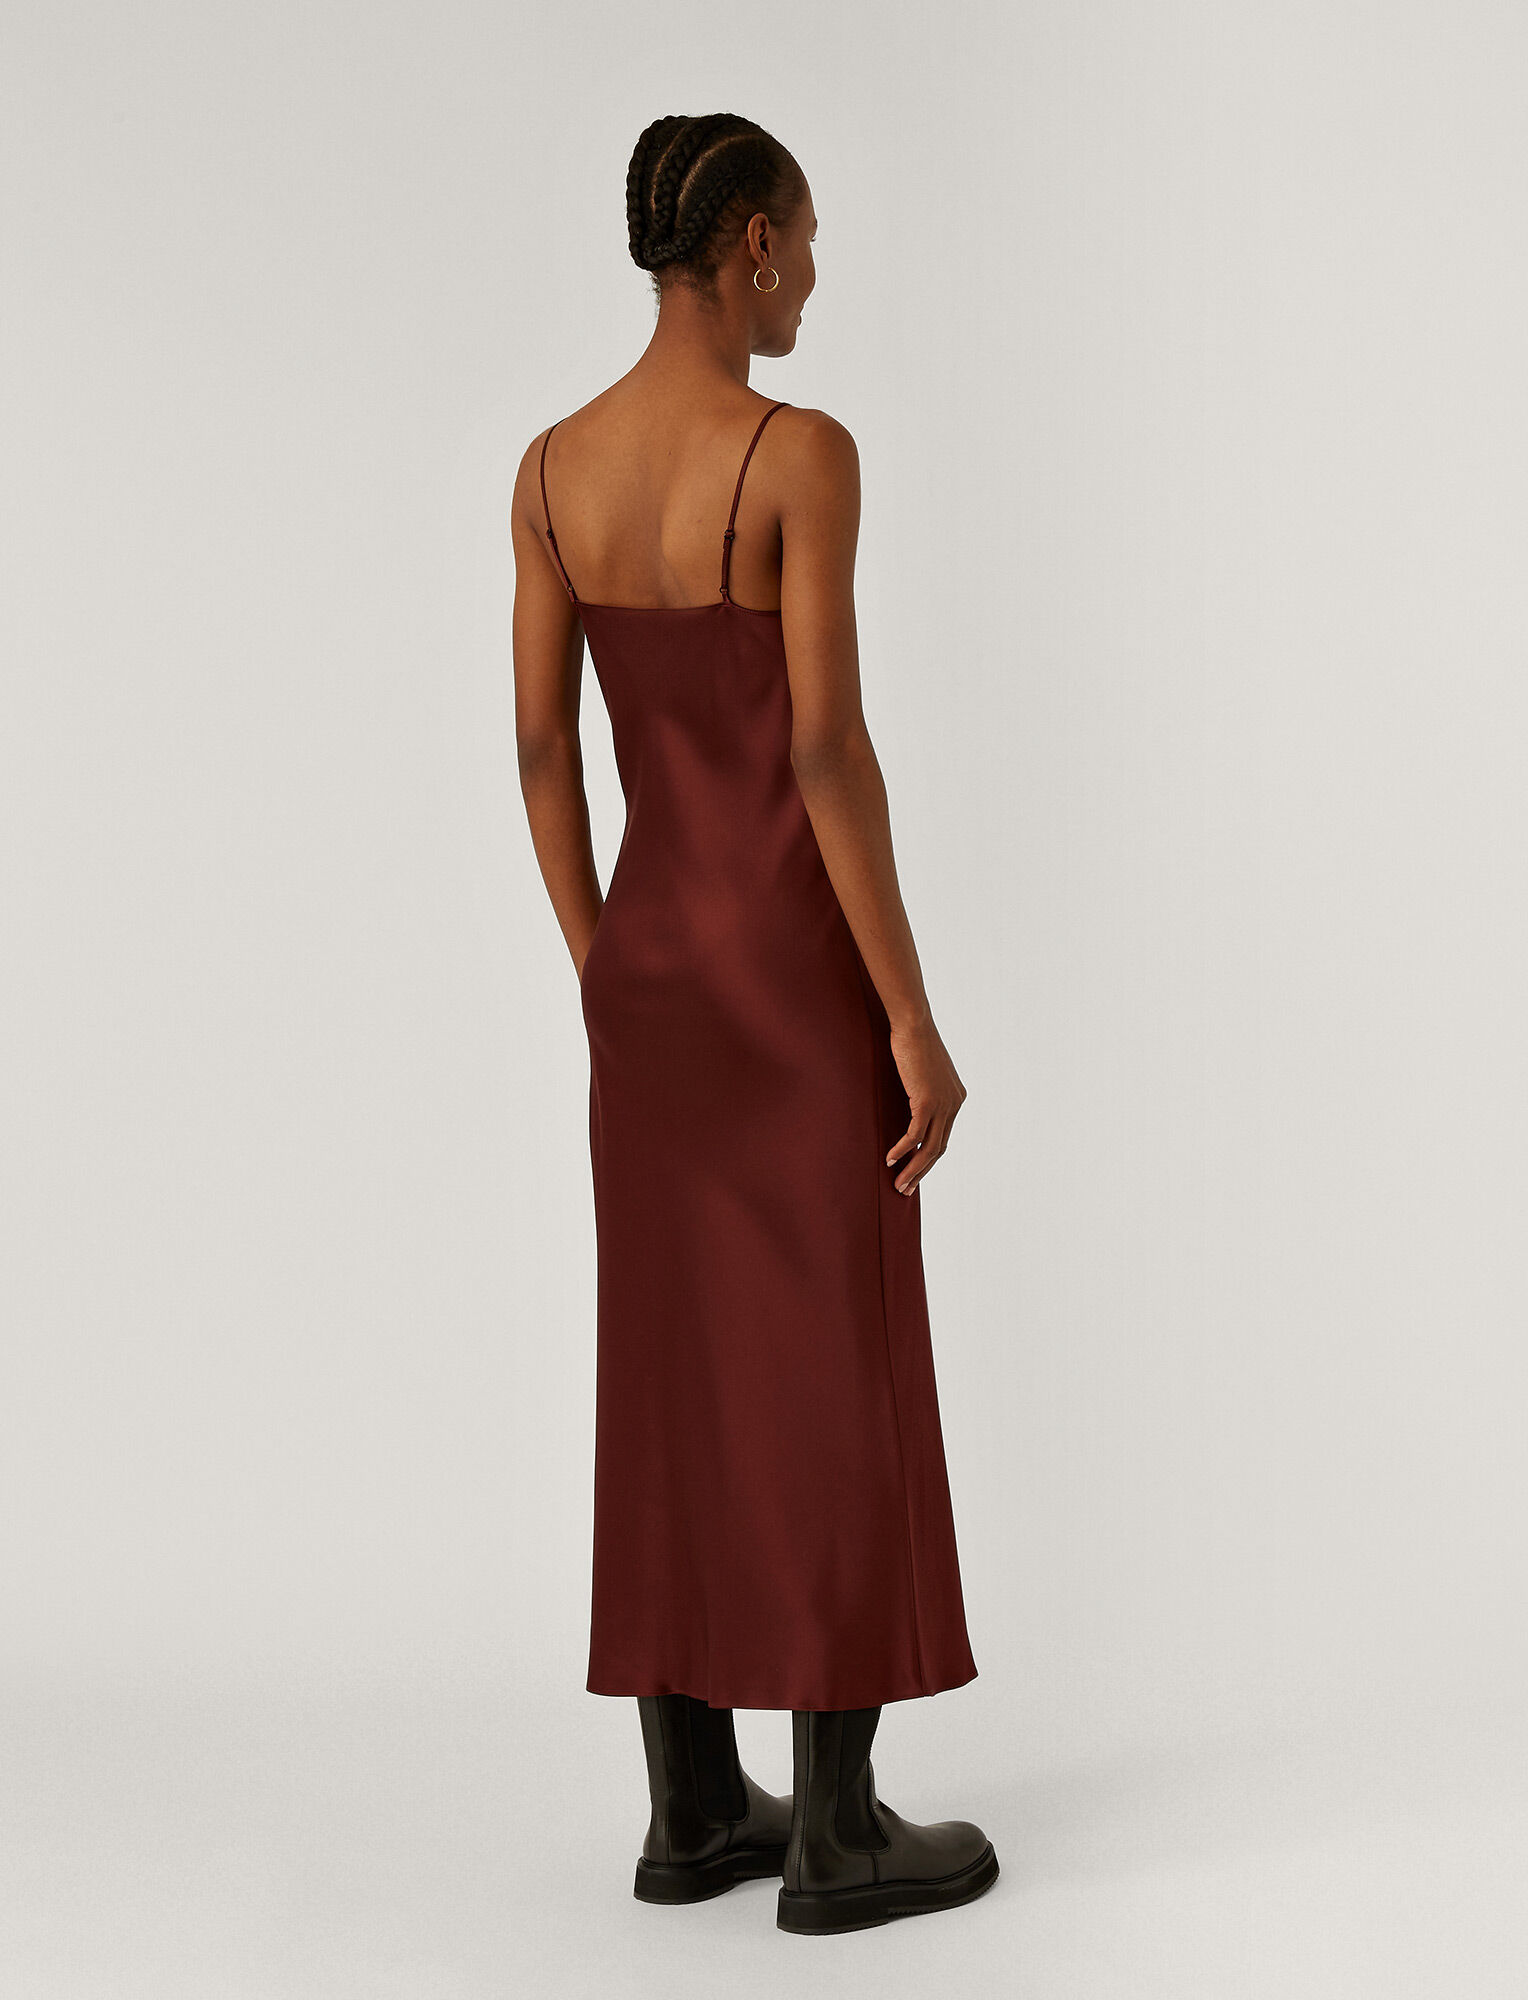 Joseph, Silk Satin Clea Dress, in GANACHE